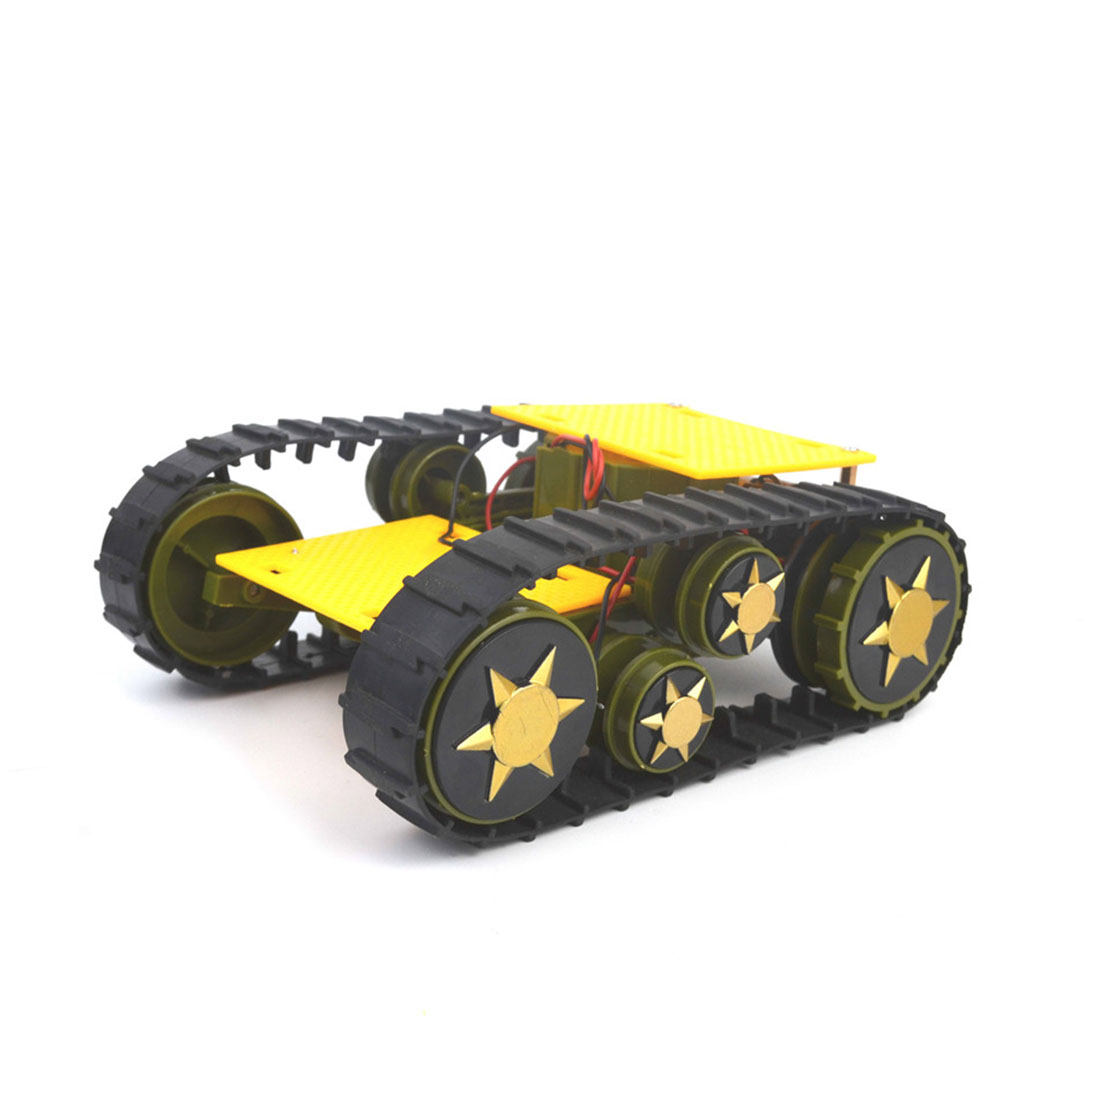 DIY Deformation Smart Tank Robot Crawler Caterpillar Vehicle Platform For Arduino SN1900